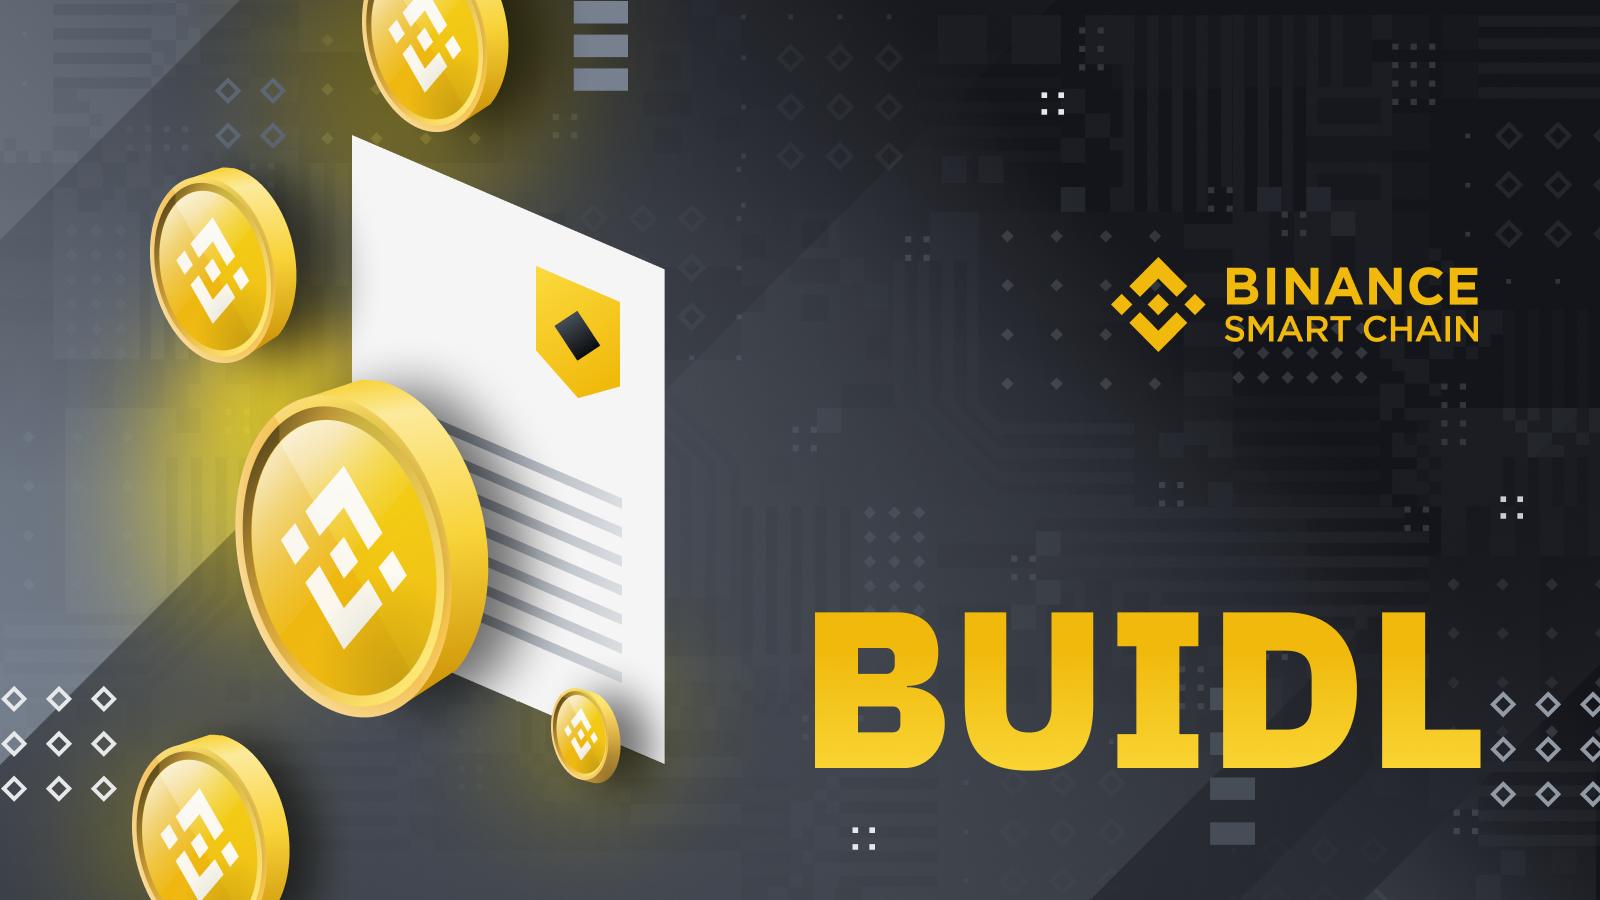 BUIDL Reward Program Updates with $1 Million Dollar Distributed as March Reward